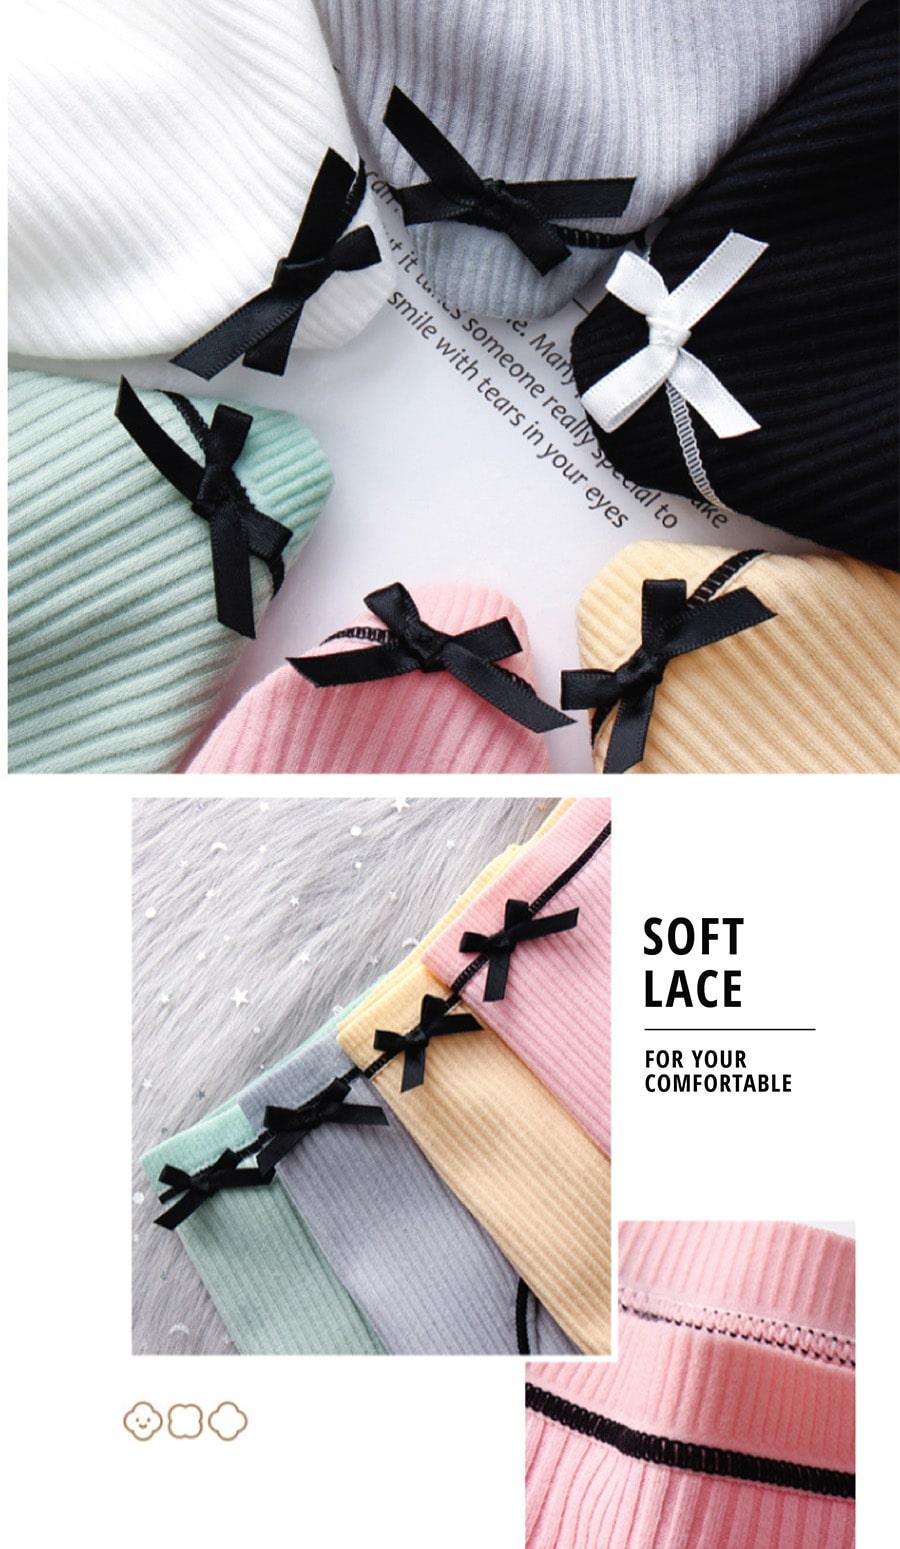 Bowknot Cotton Panties - Features